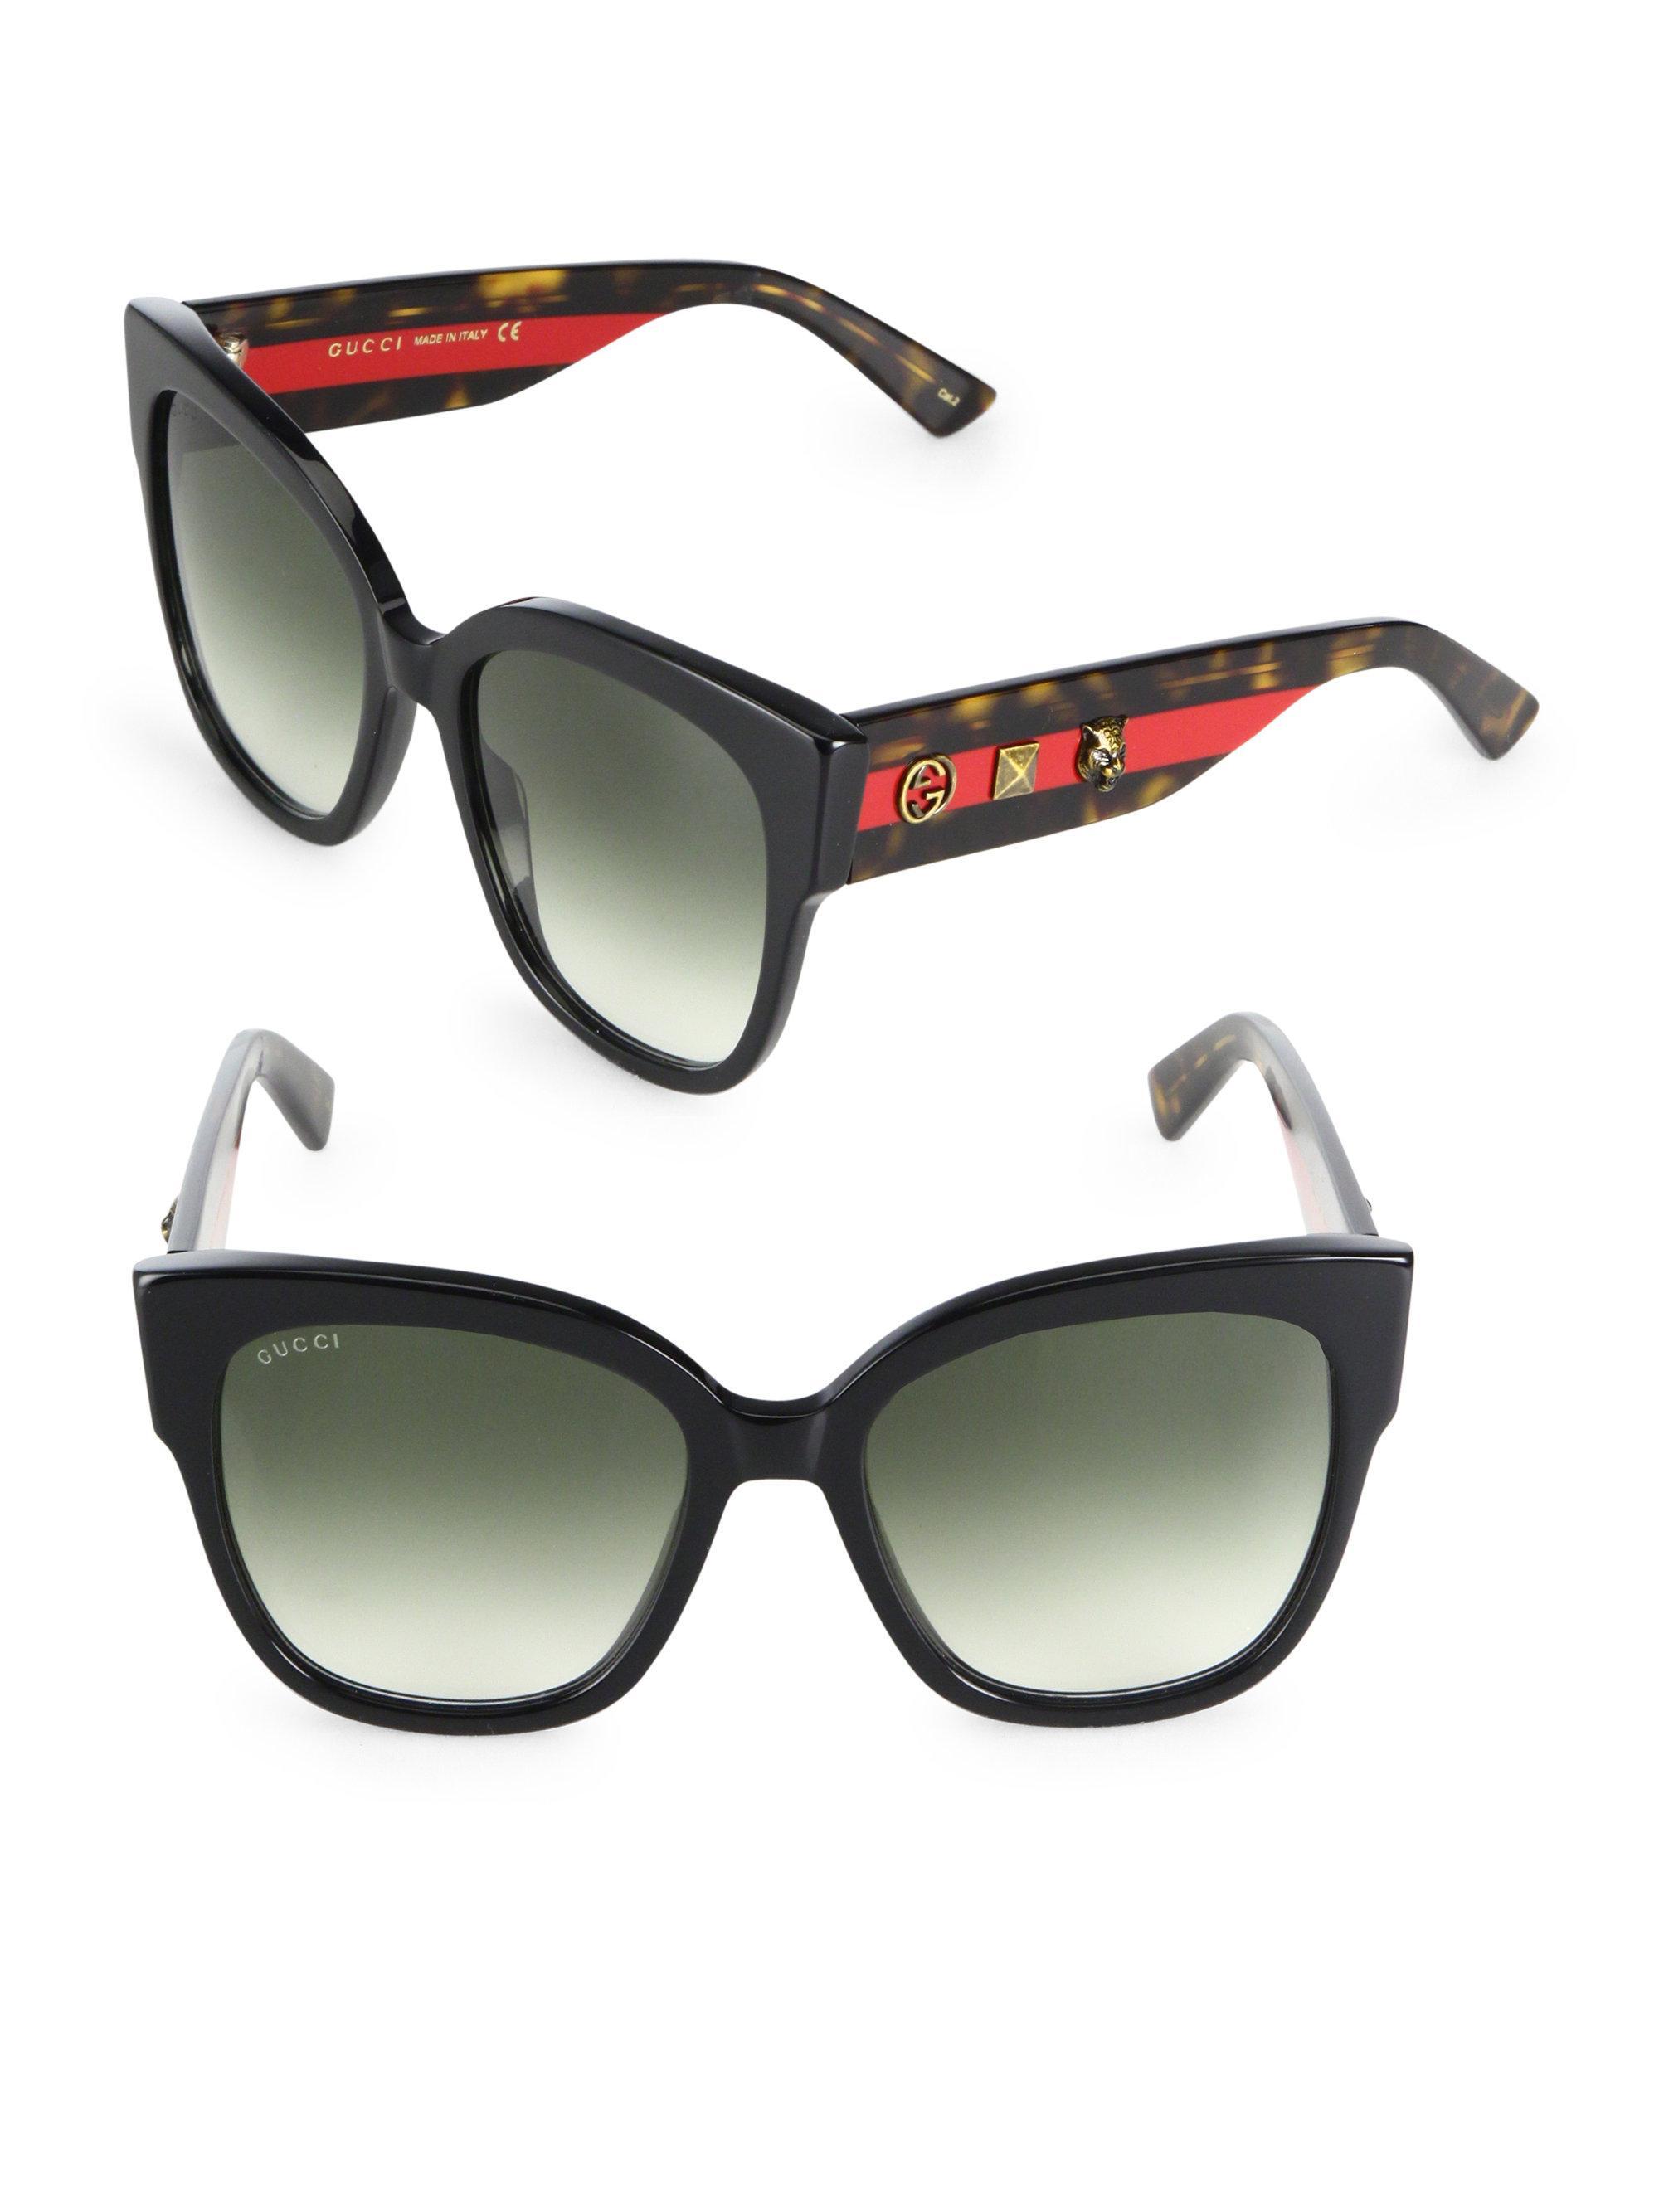 e0e91755a Lyst - Gucci 55mm Oversized Studded Square Cat Eye Sunglasses in Black